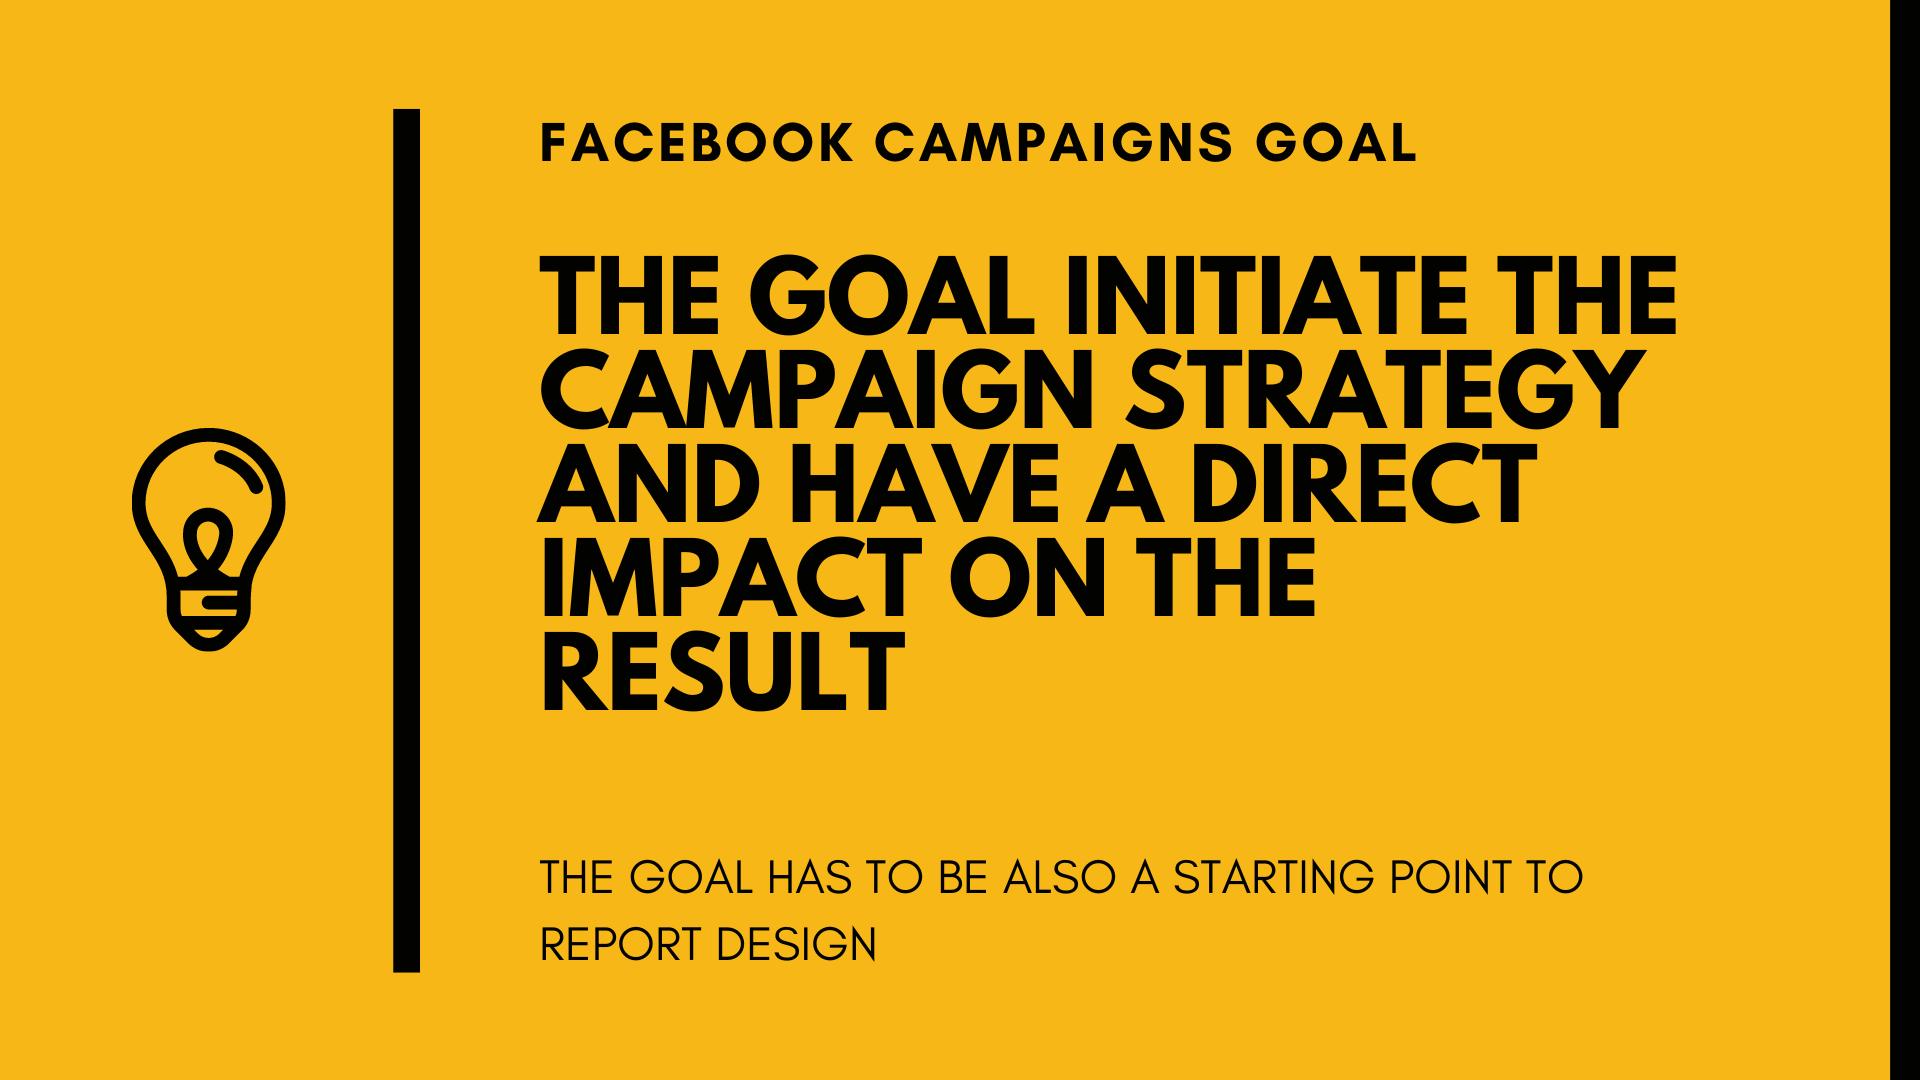 Facebook campaigns goals